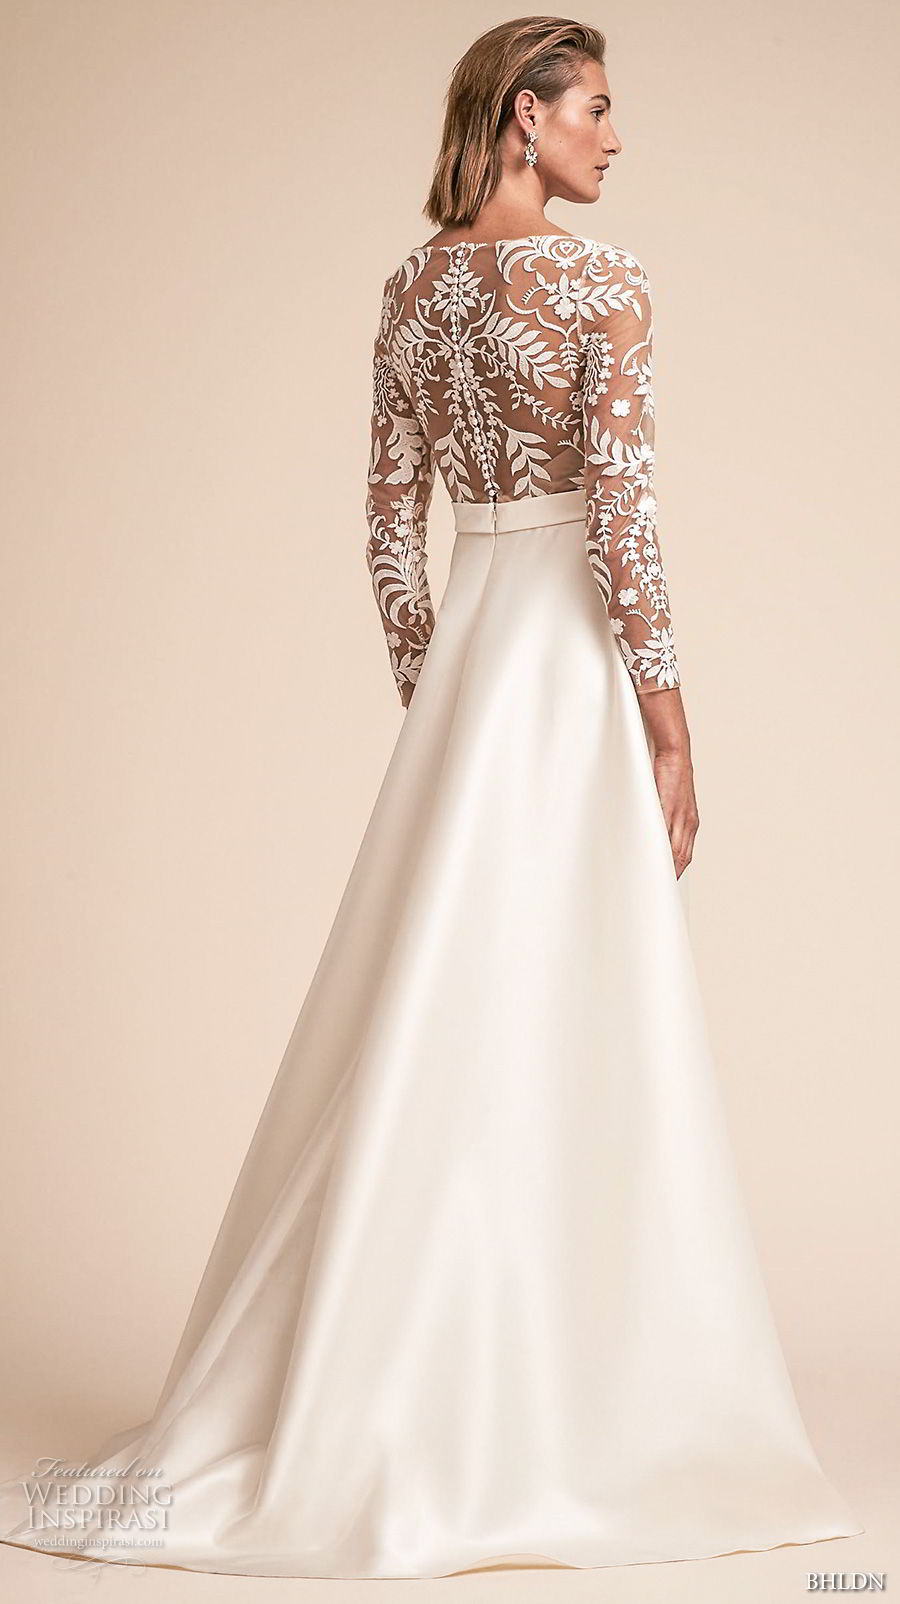 Bhldn Spring 2018 Wedding Dresses Wedding Inspirasi,Wedding Guest Pinterest Lace Dress Styles